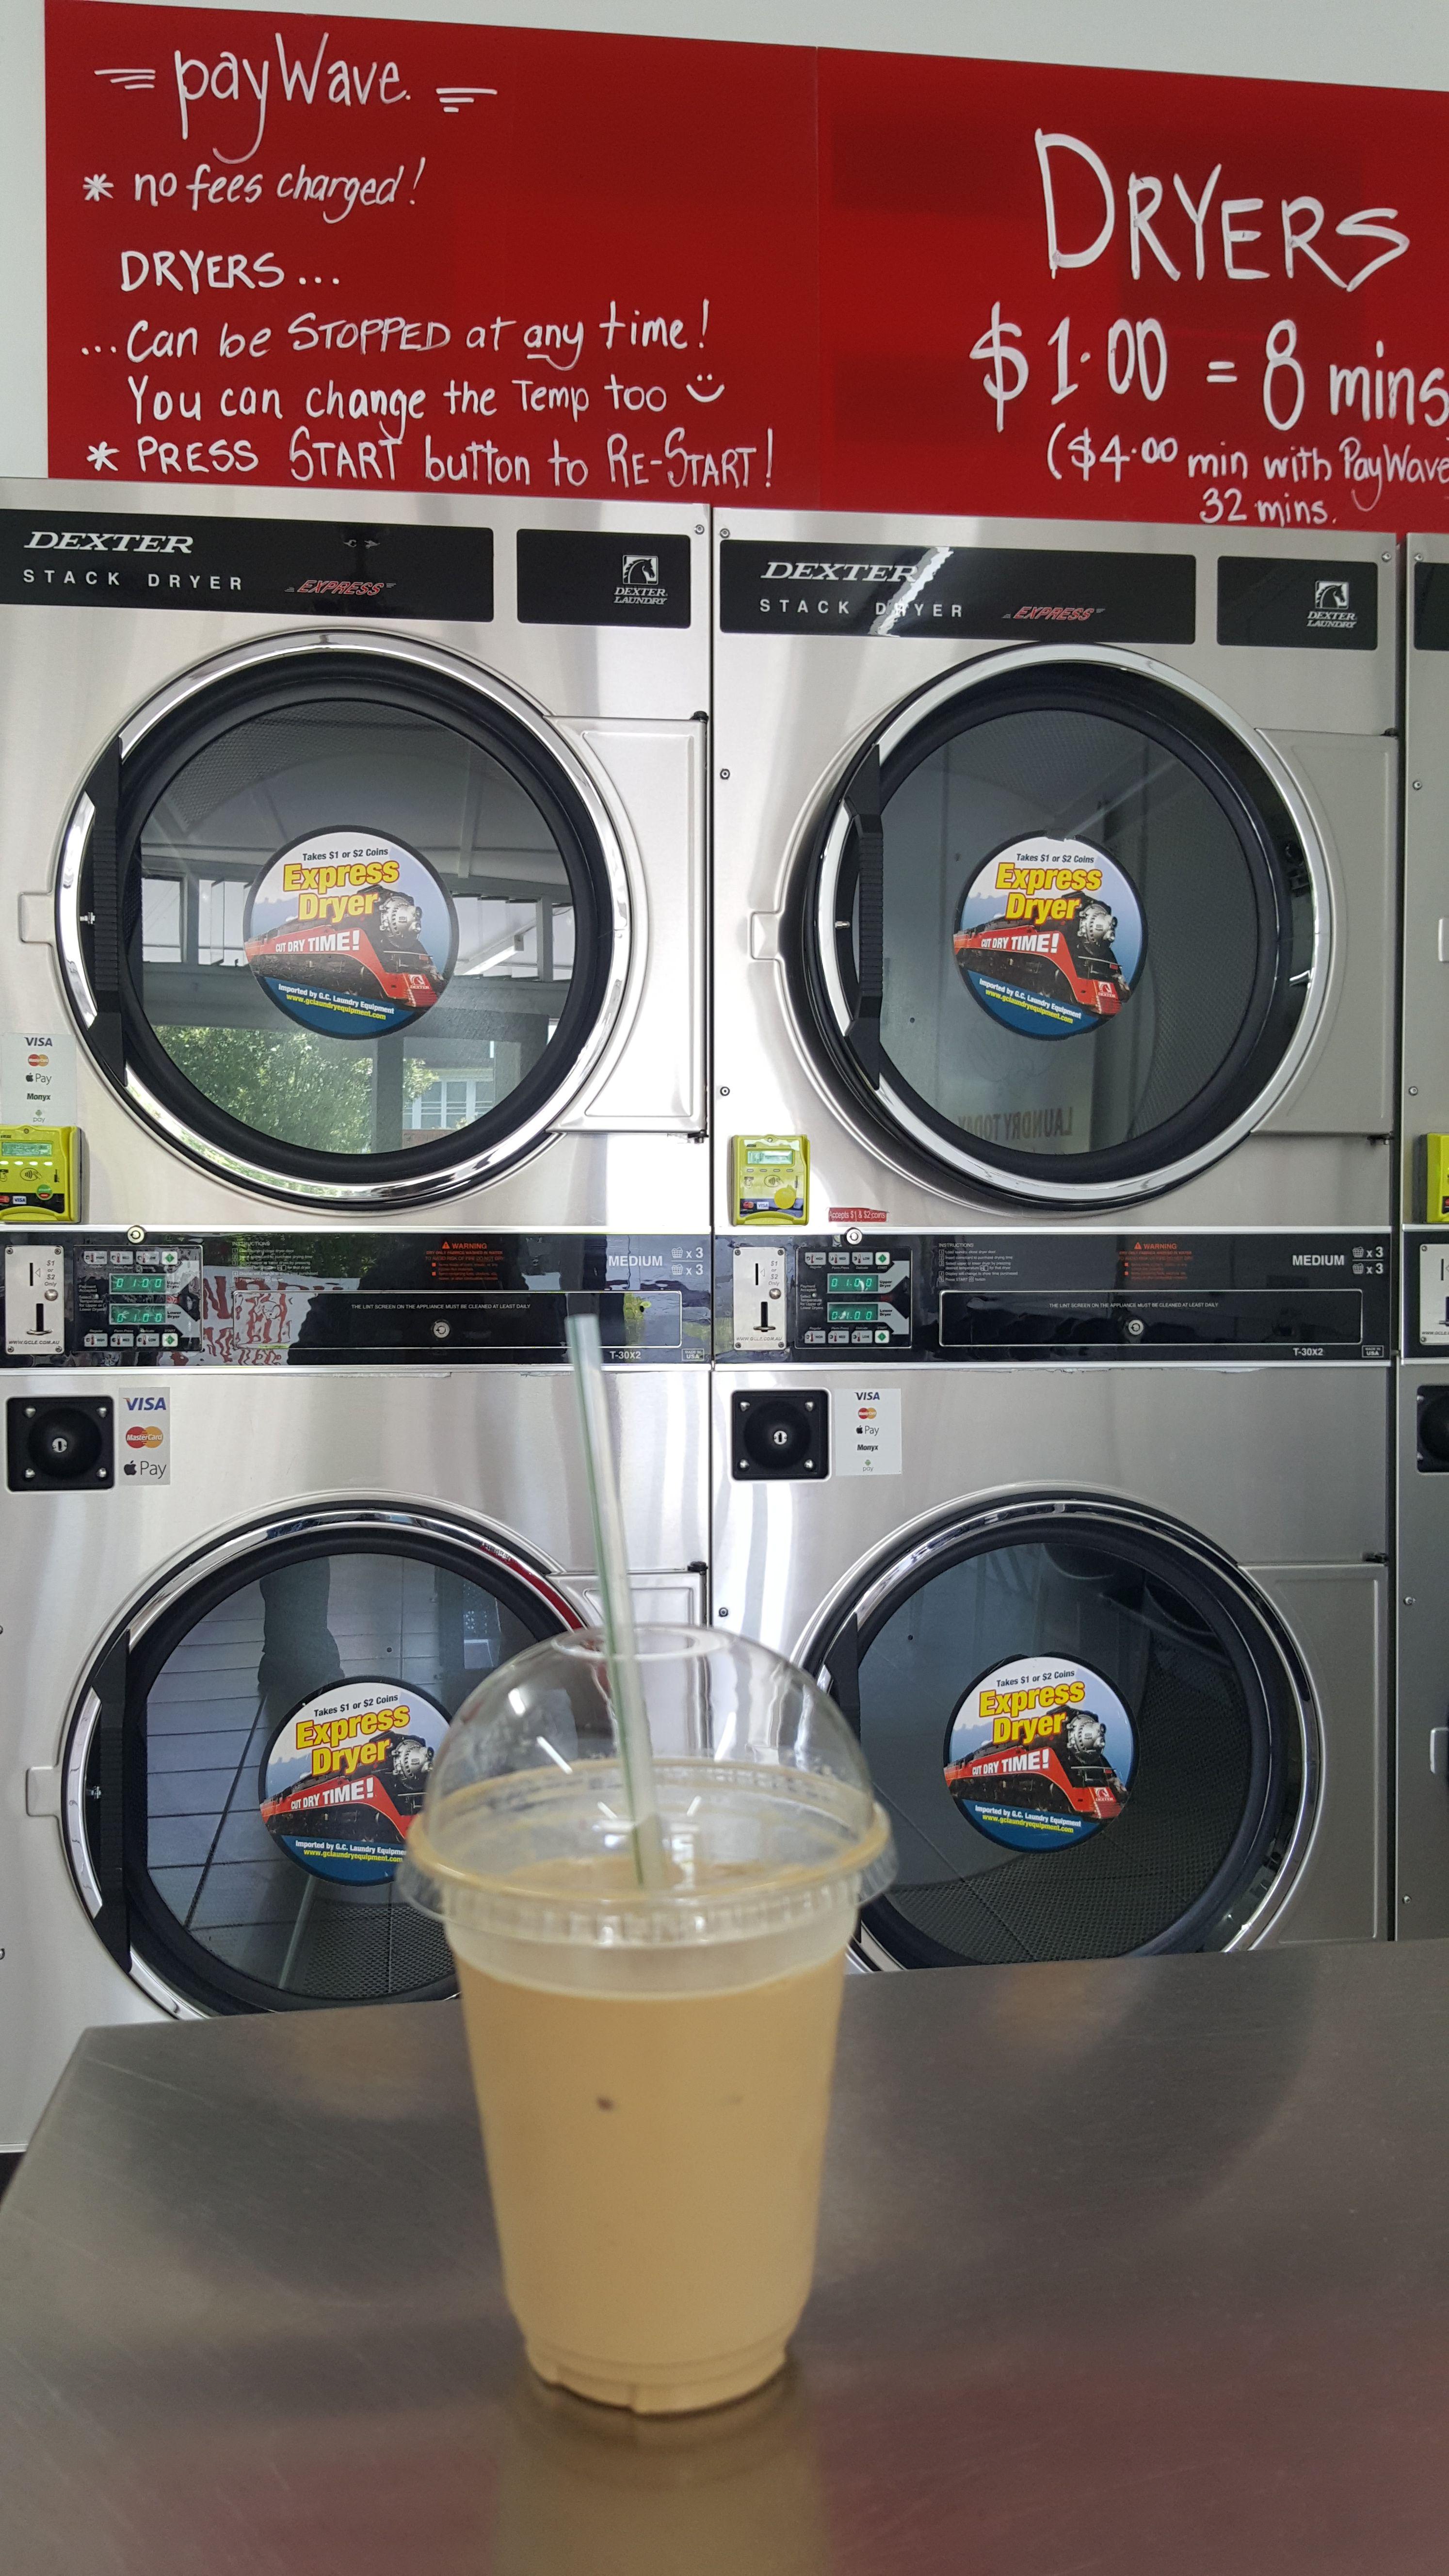 Pin By Indooroopilly Laundromat On Indooroopilly Laundromat Taringa Laundry Dryer Canning